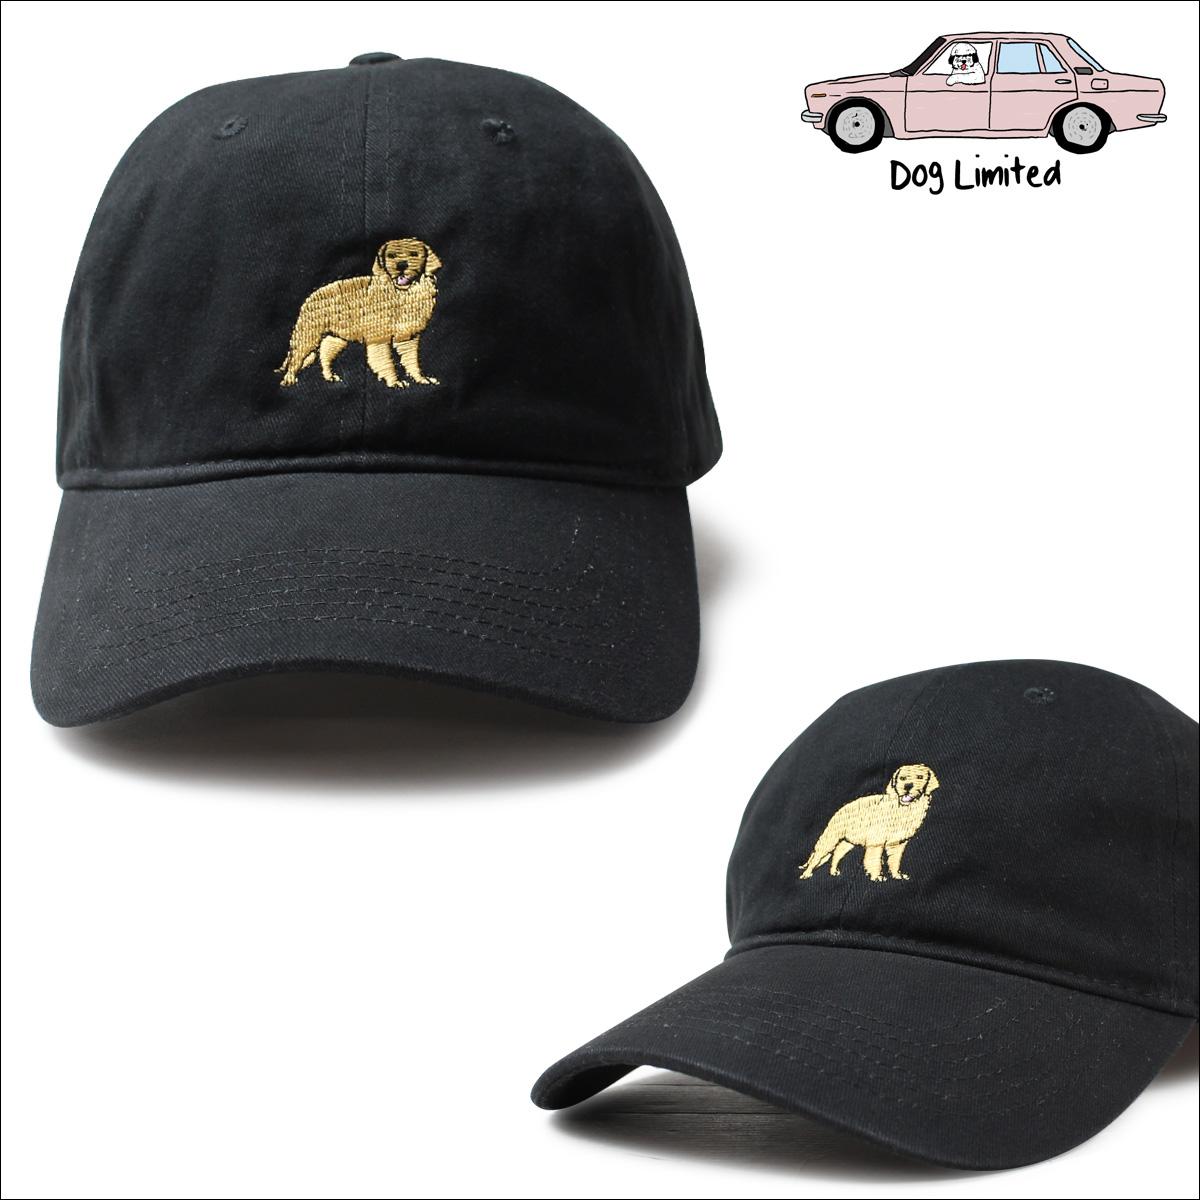 Dog limited hat men gap Dis cap Dog Limited ダッドキャップストラップバック GOLDEN RETRIEVR DAD CAP black